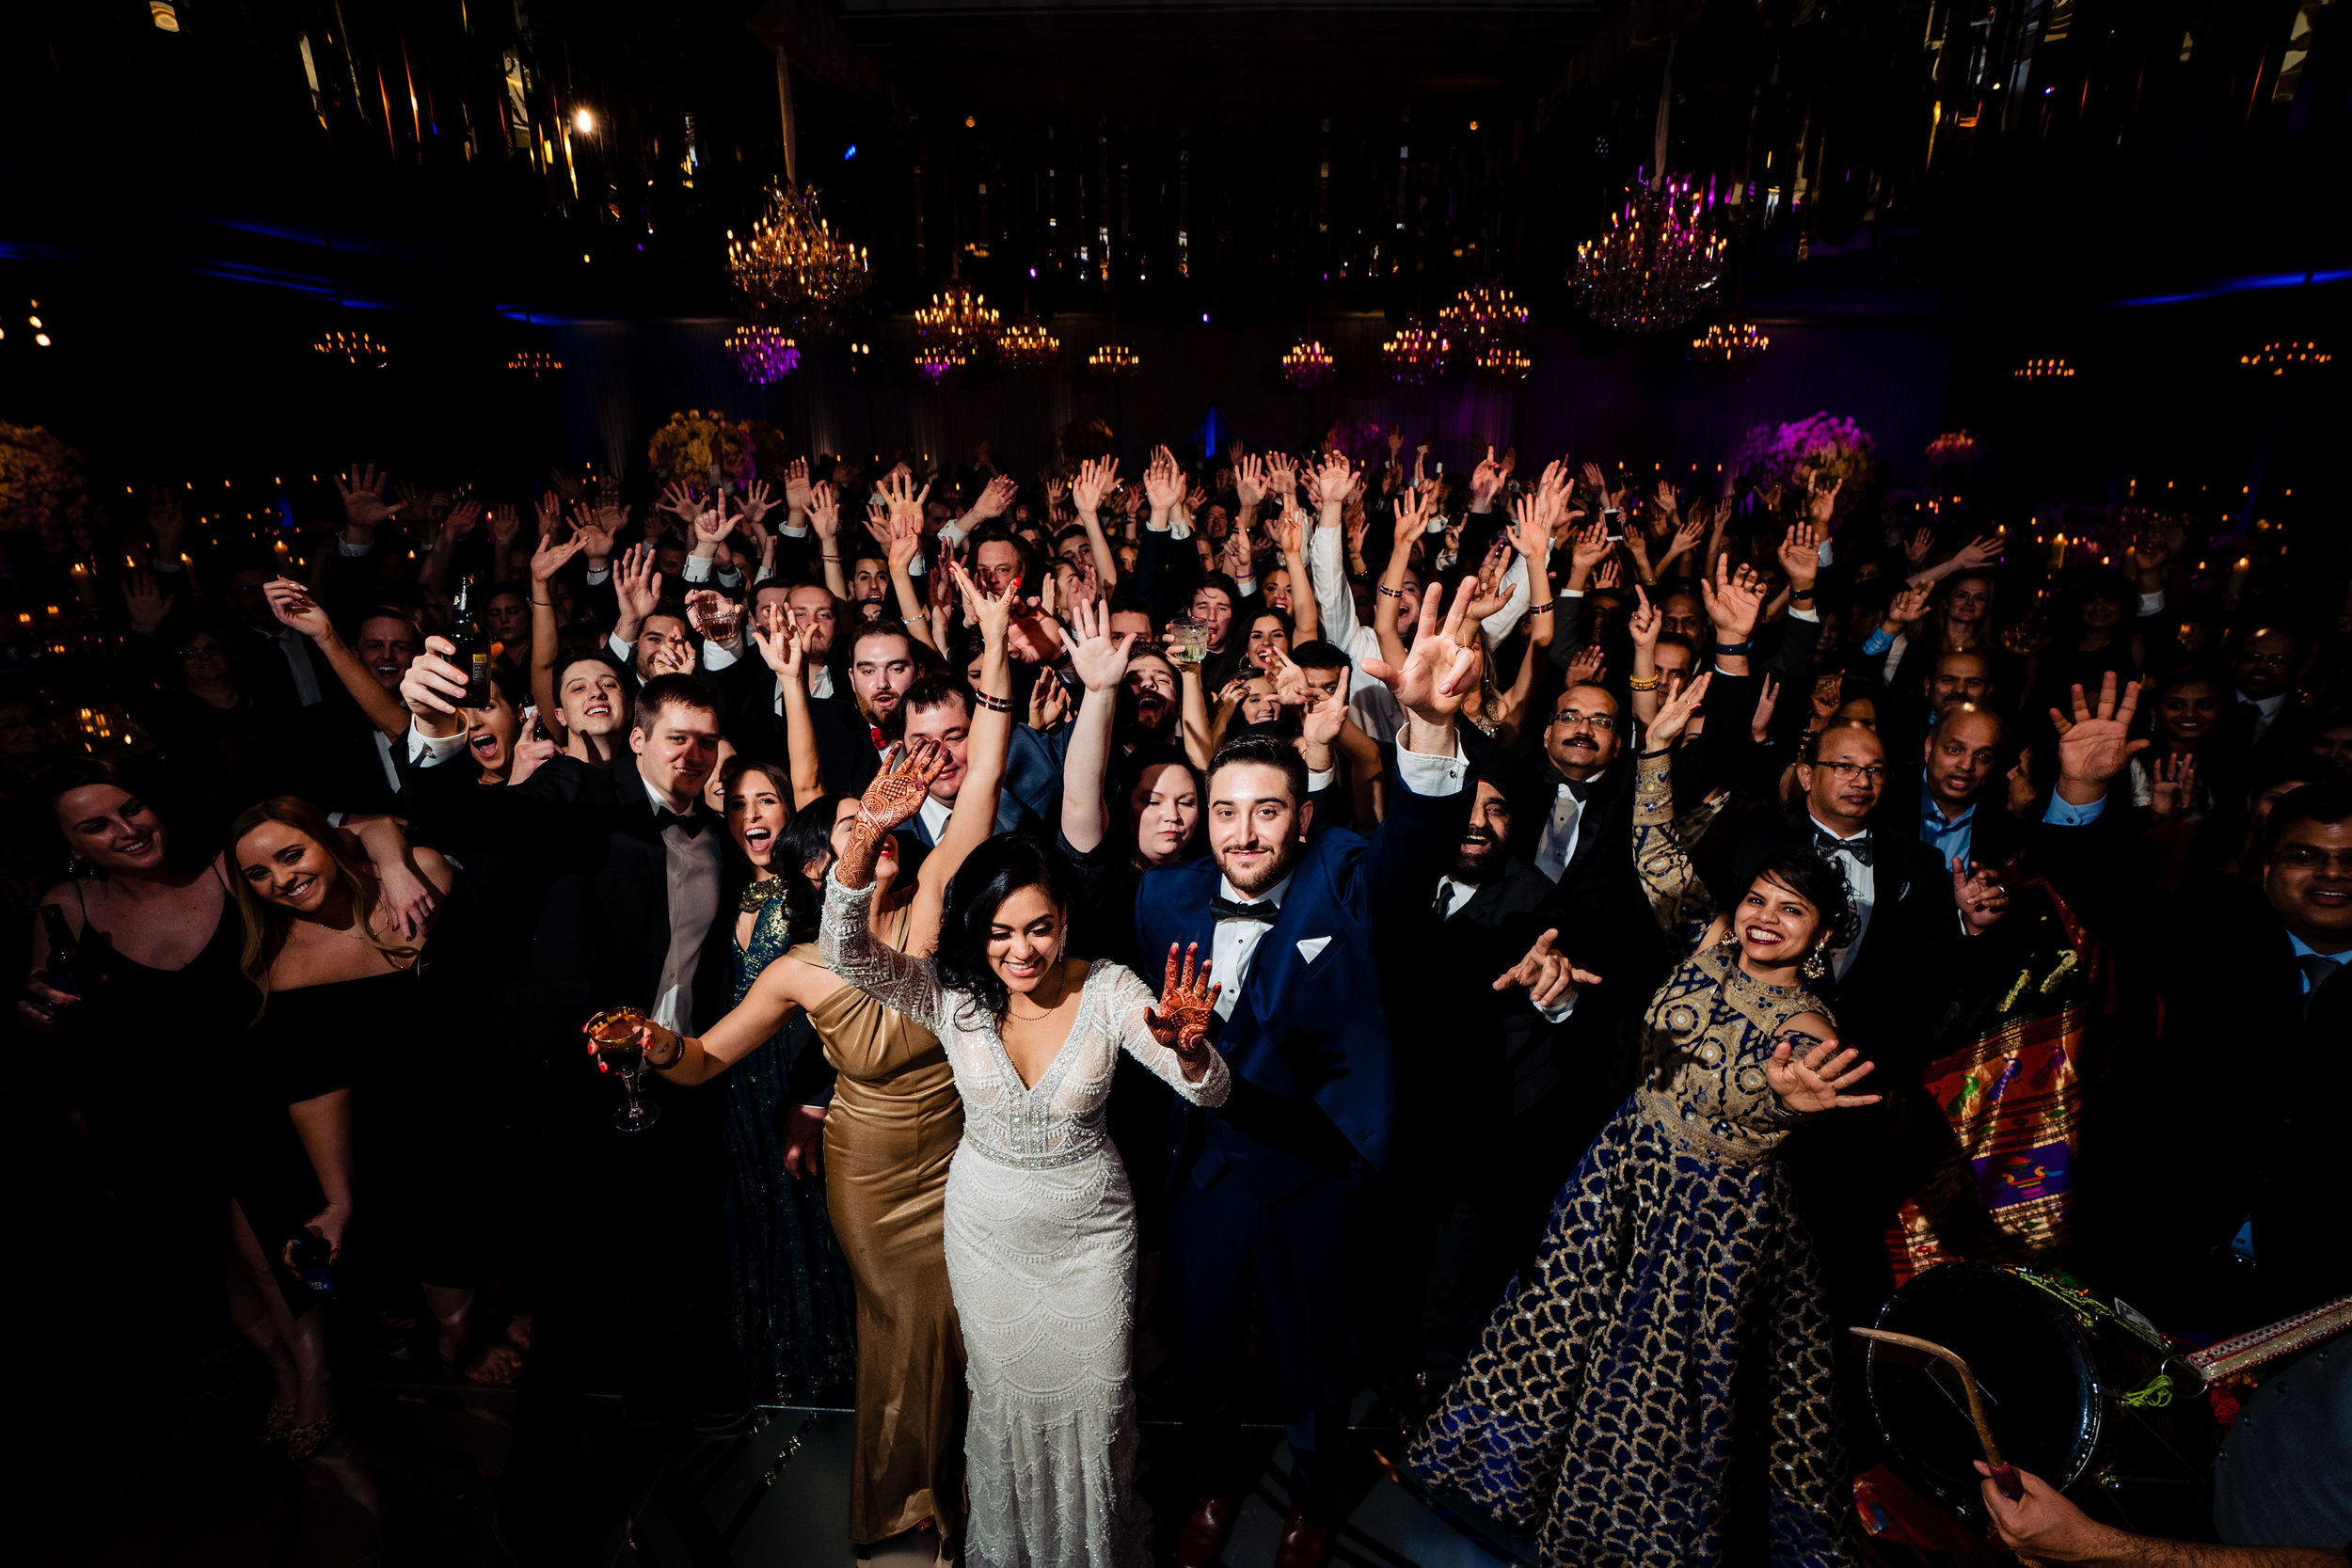 INDIAN WEDDING RECEPTION PARTY.JPG